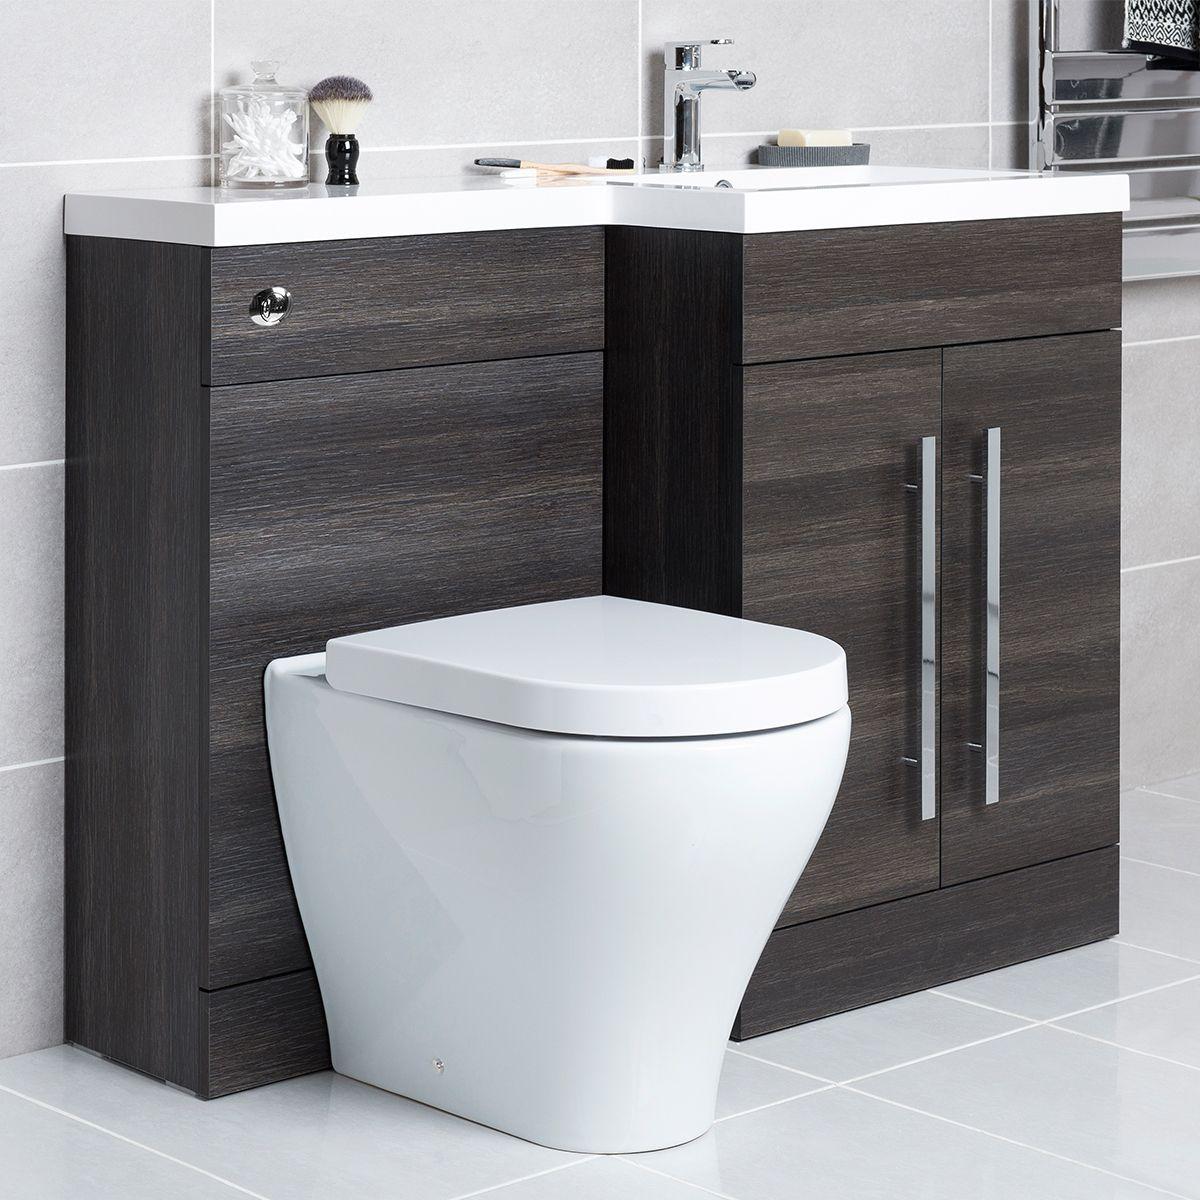 Stupendous Details About Bathroom Vanity Unit Designer Furniture Suite Home Interior And Landscaping Transignezvosmurscom